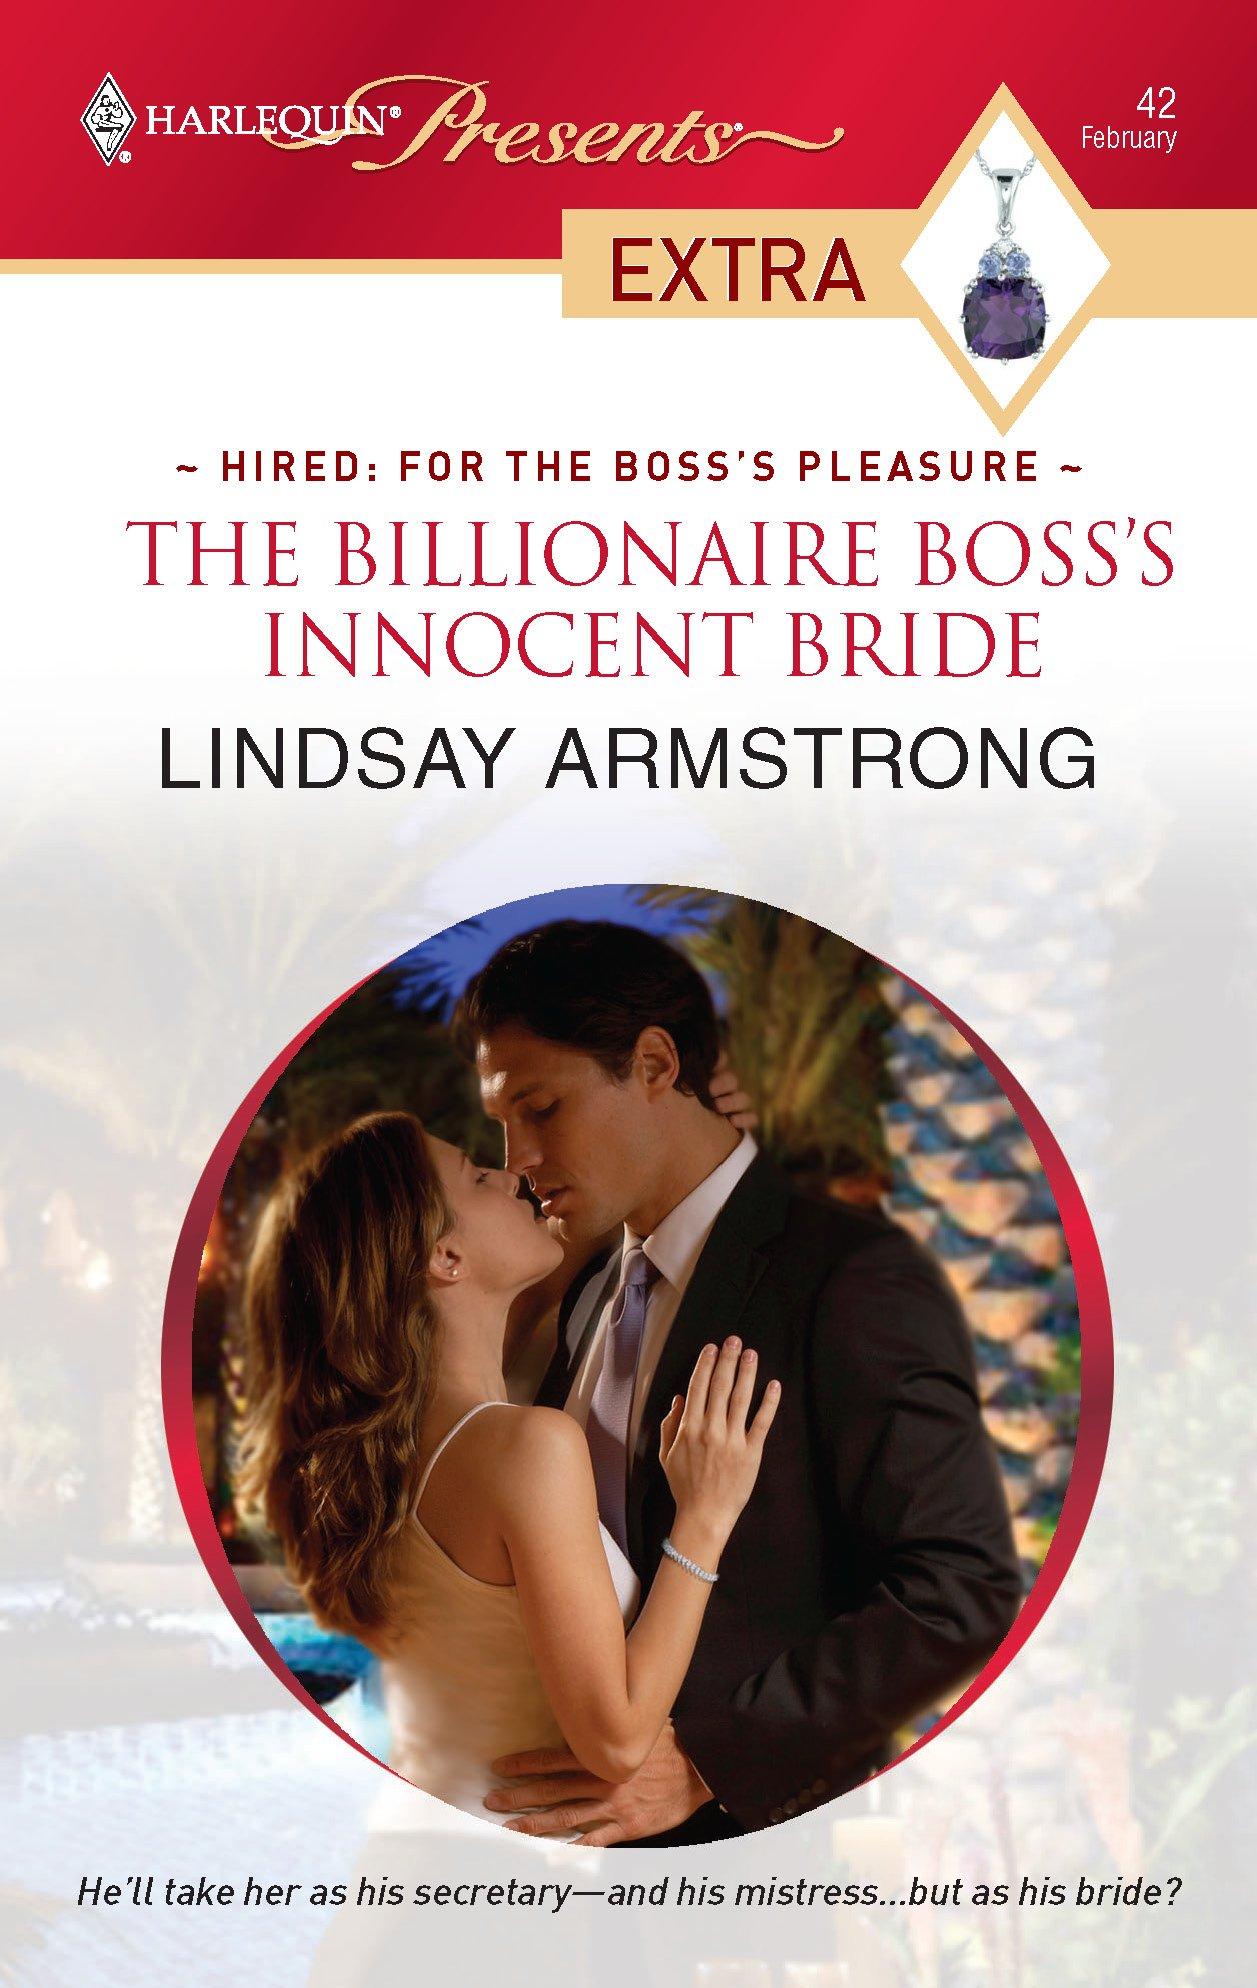 The Billionaire Boss's Innocent Bride pdf